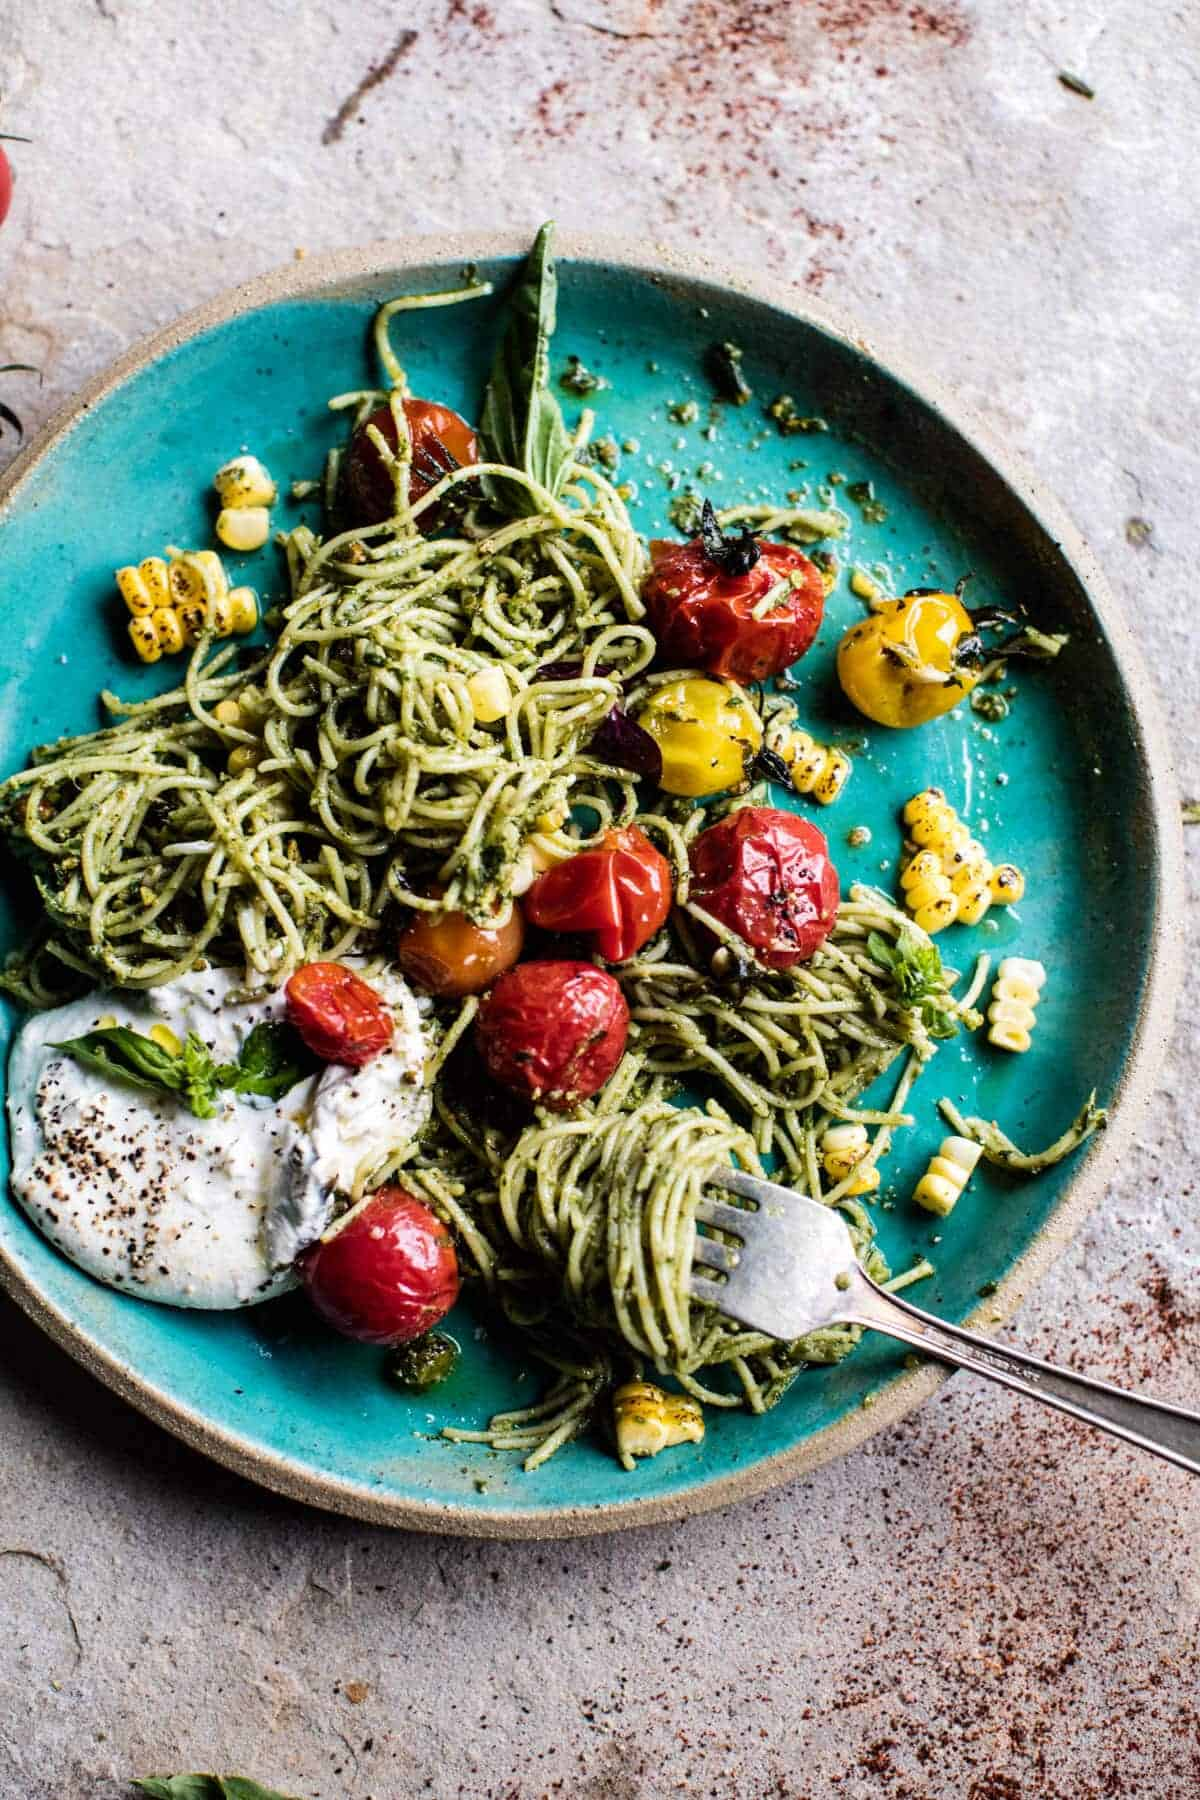 Charred Corn And Zucchini With Basil Recipes — Dishmaps